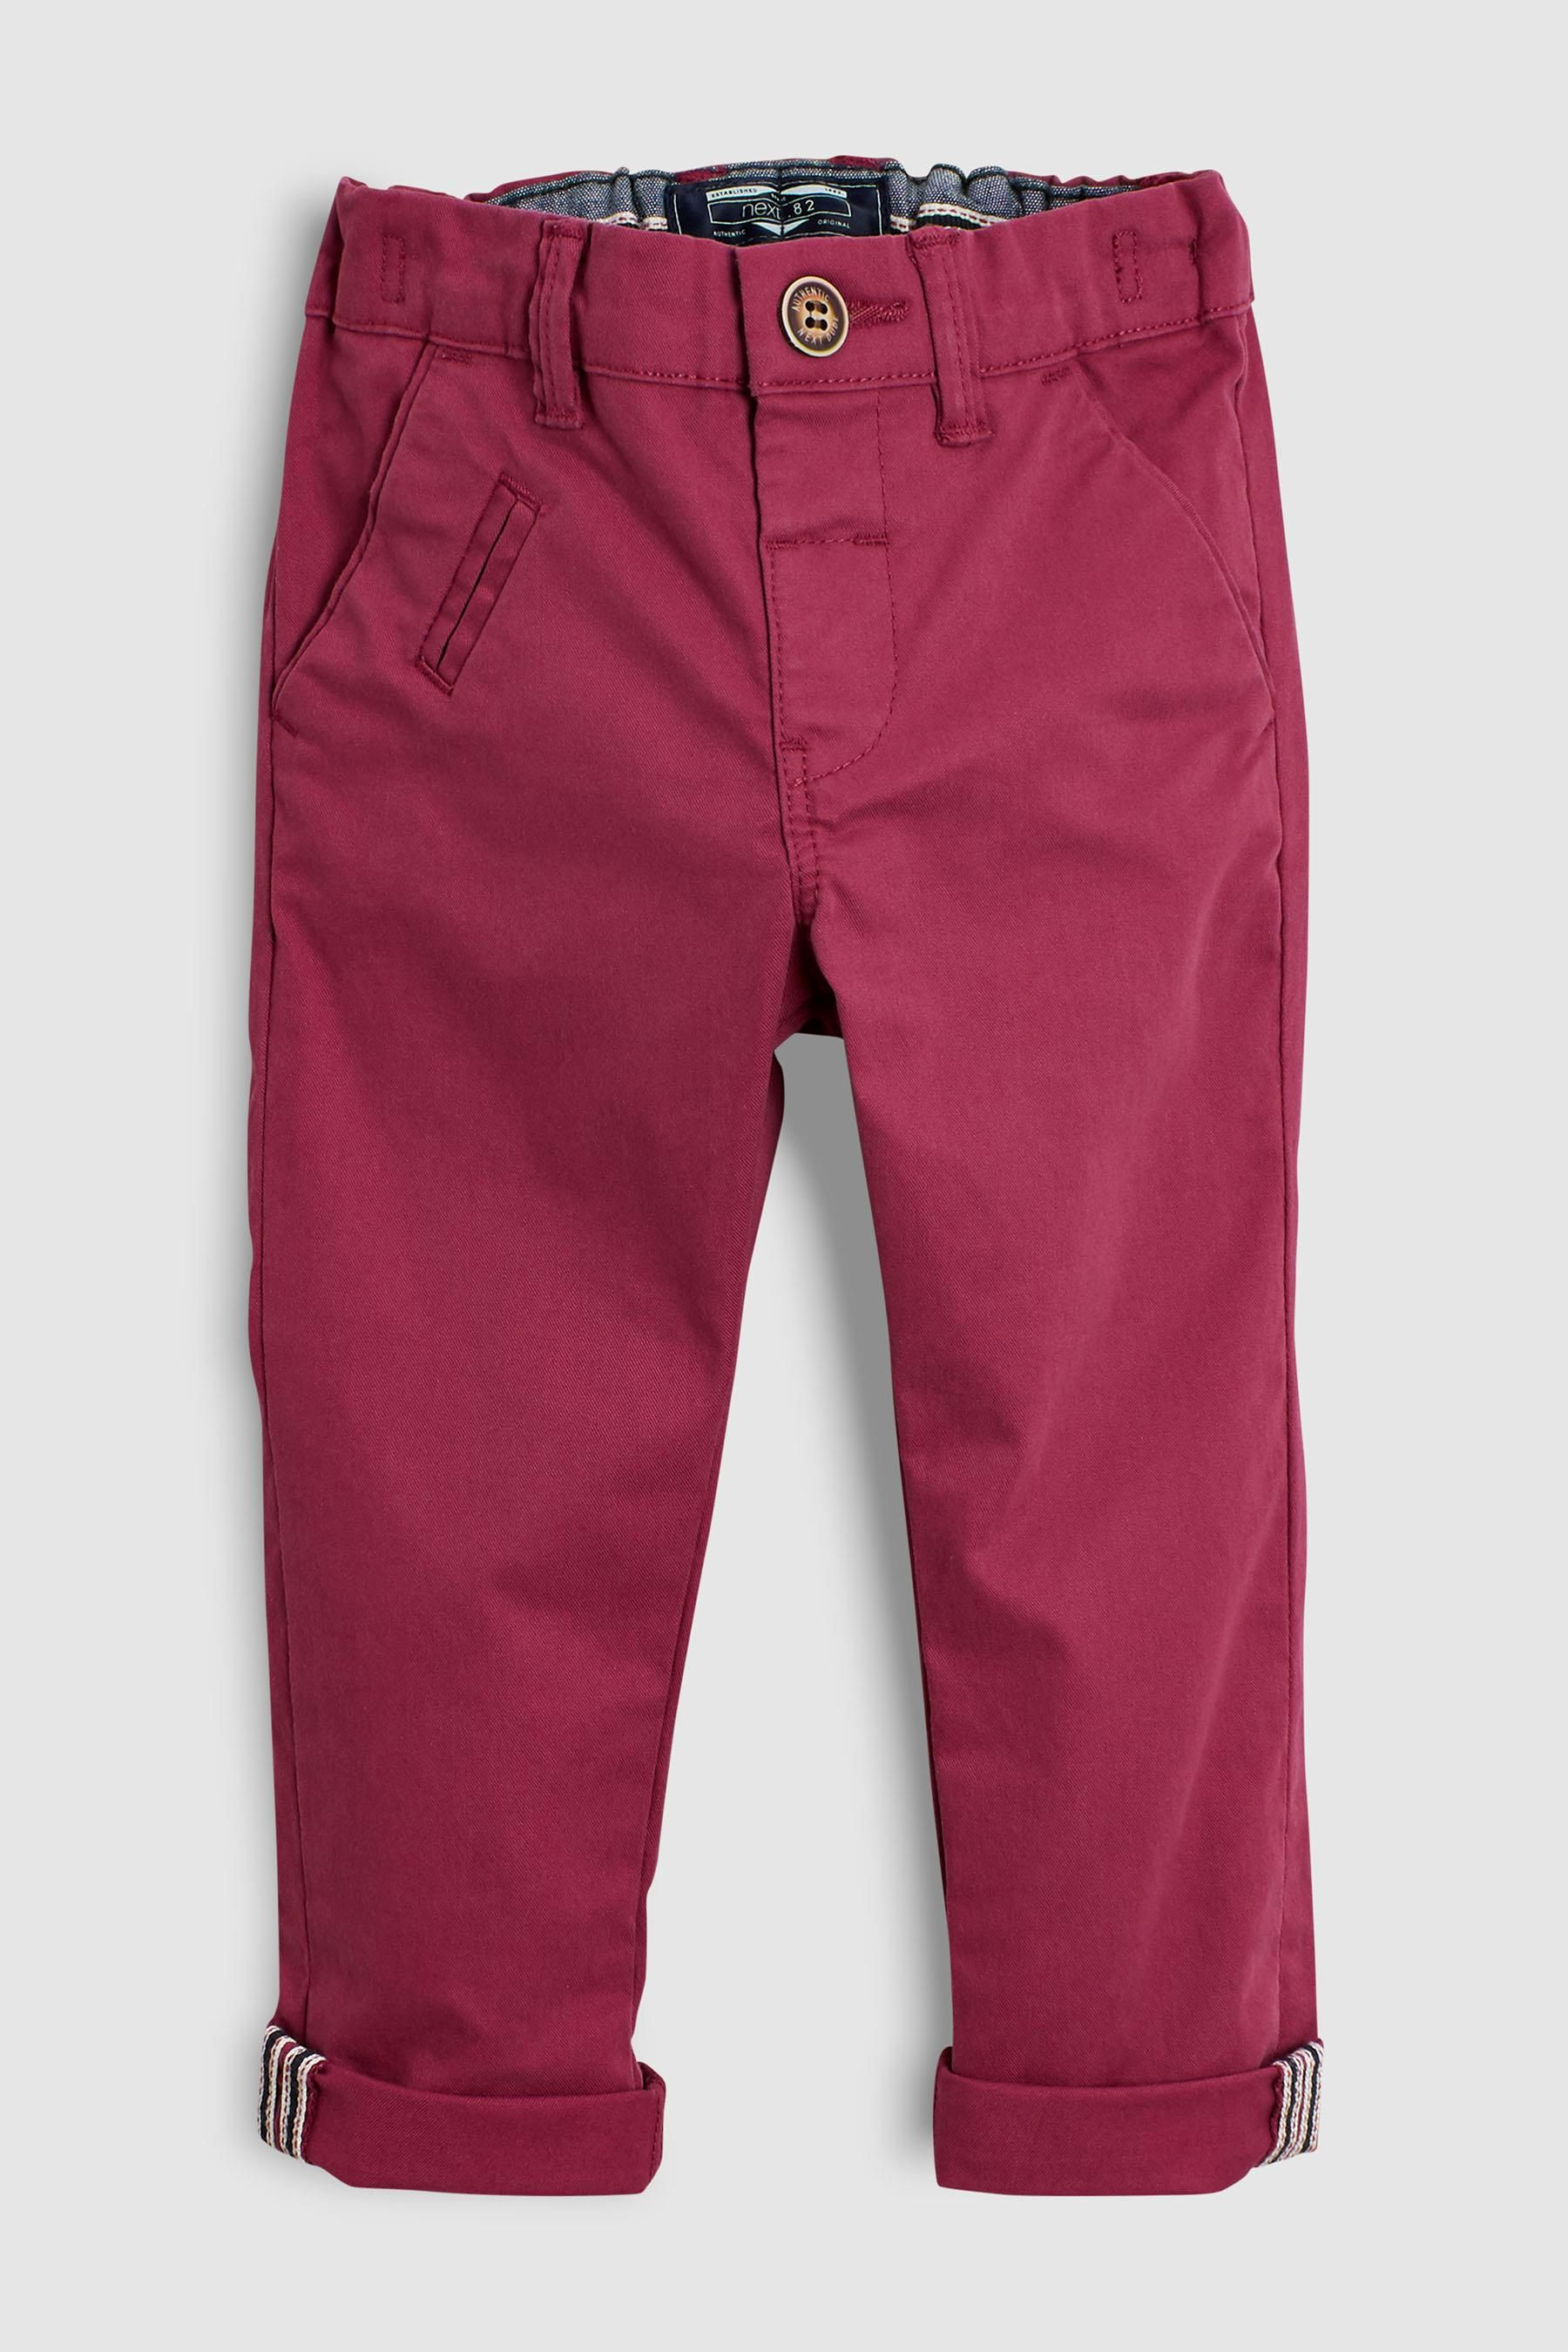 Chinos (Multi Colour) $15.50 - $17